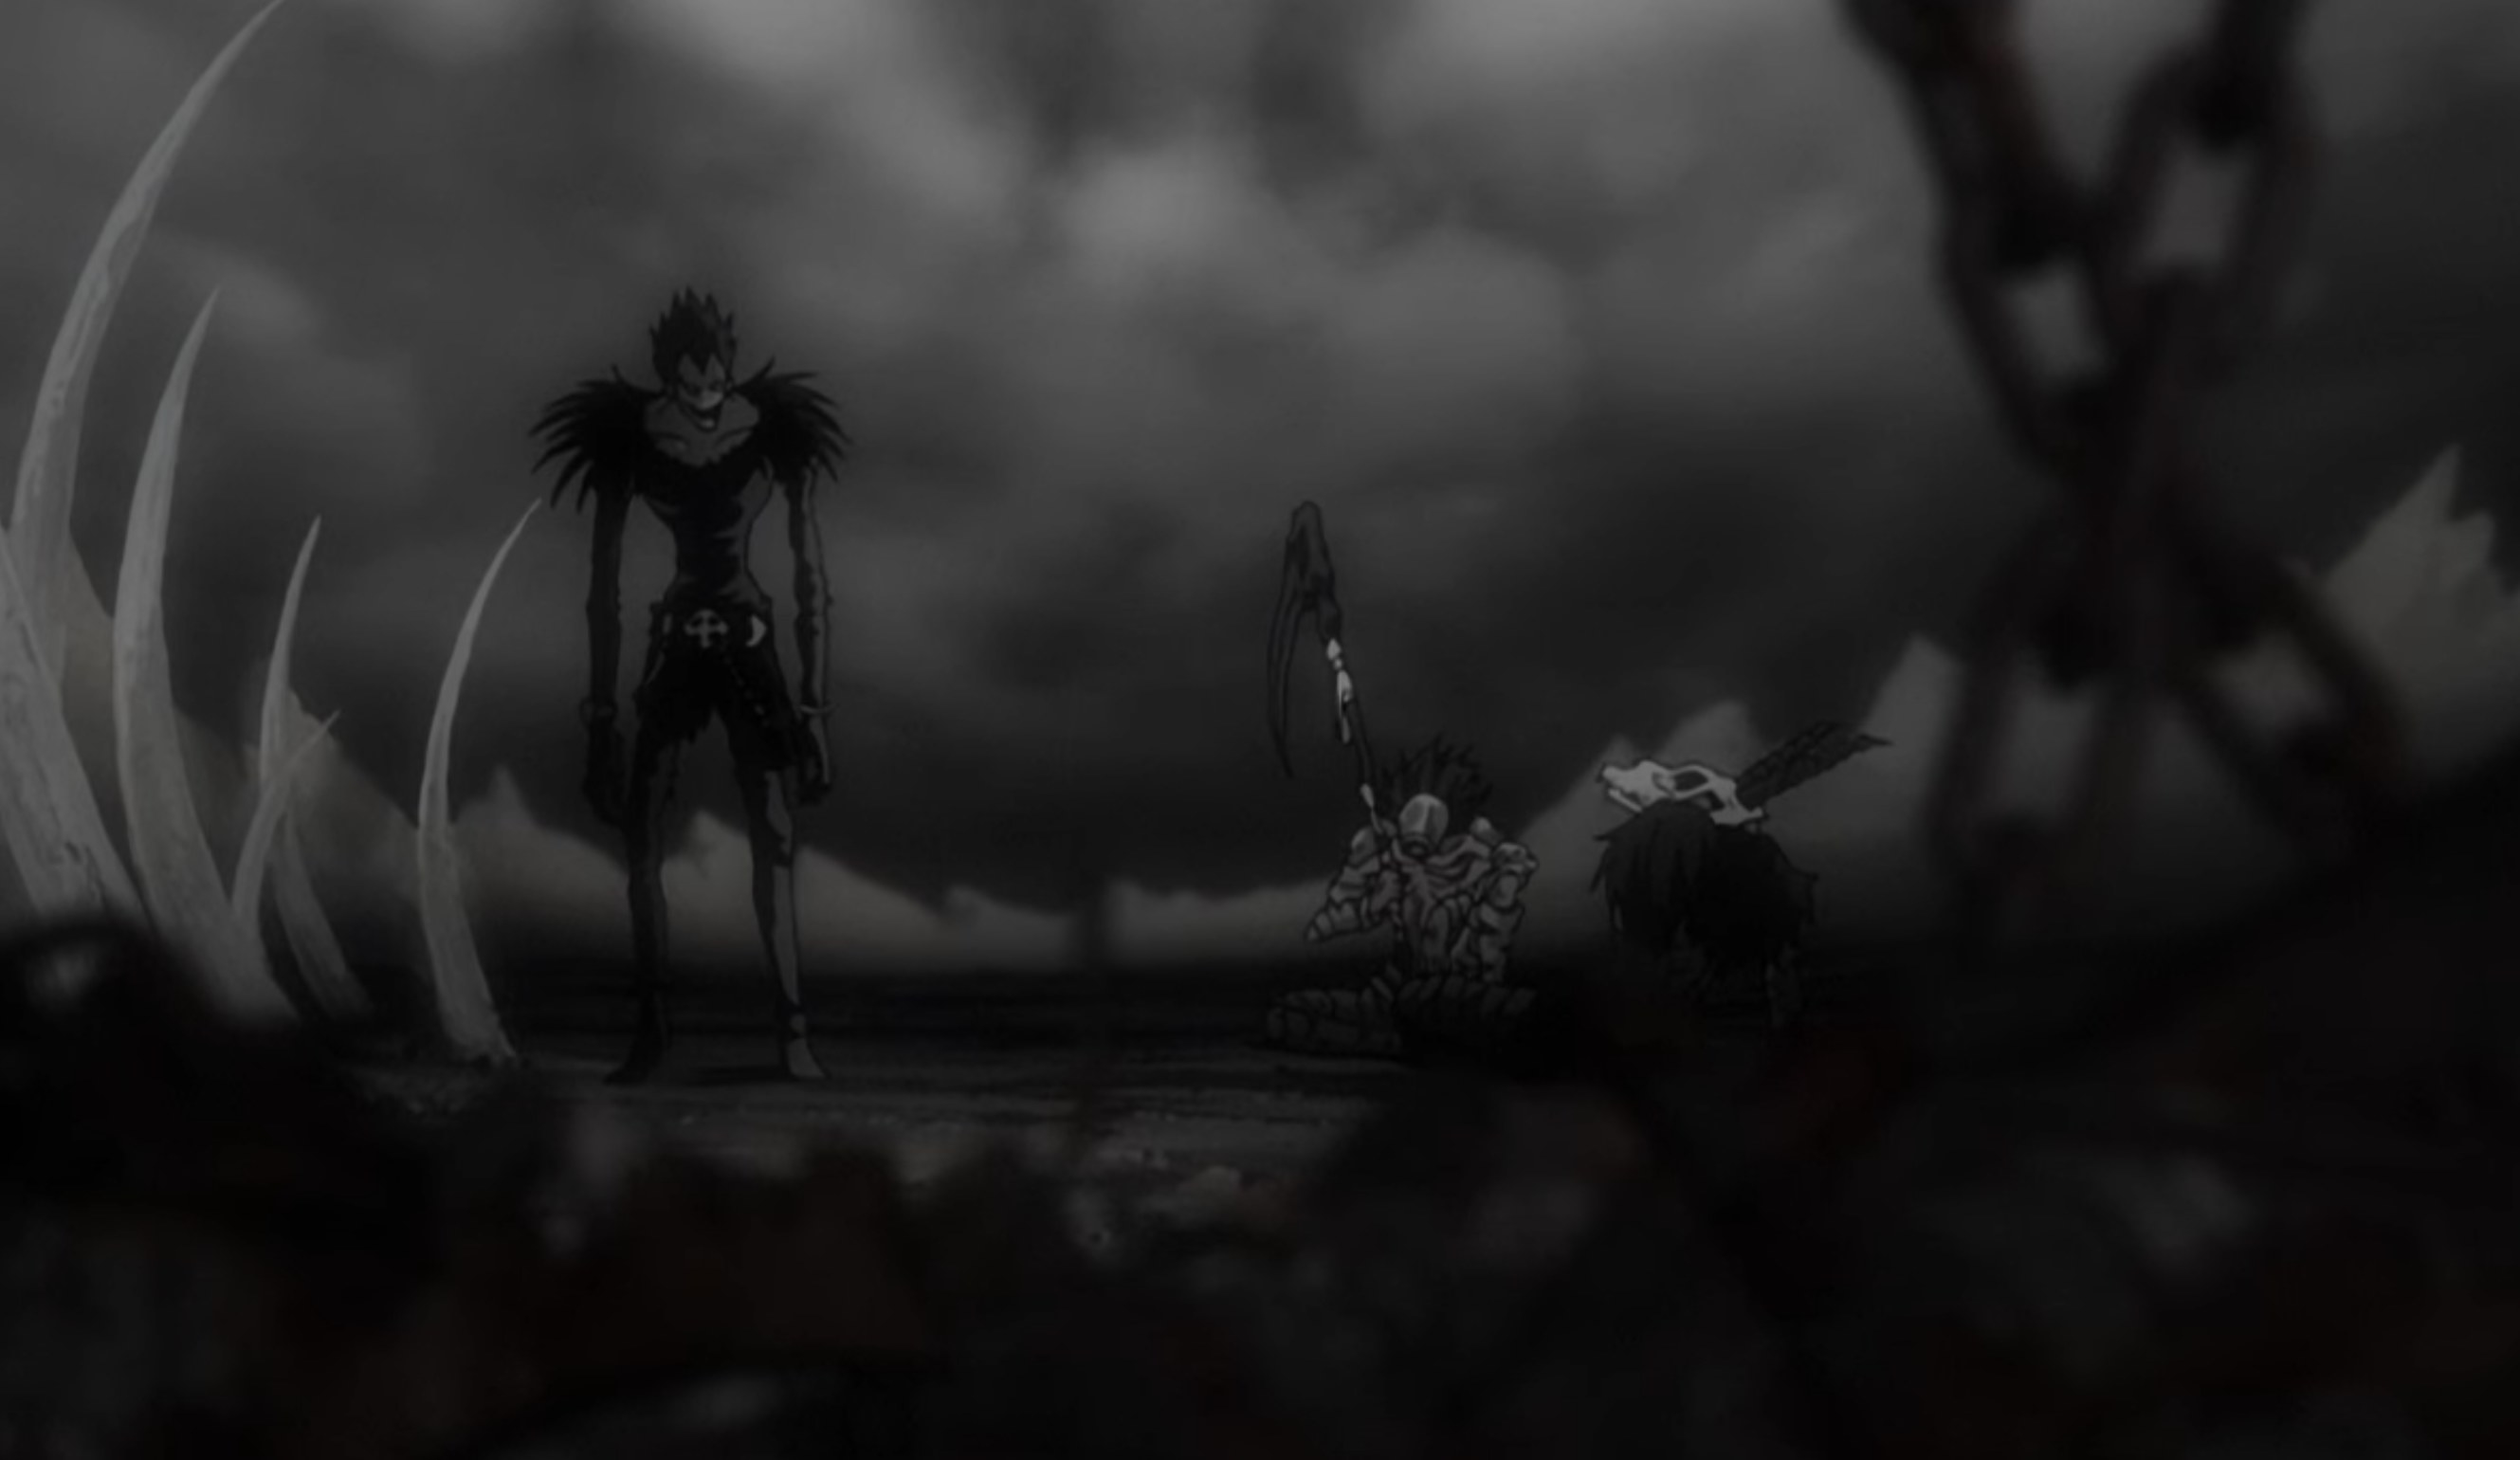 A creepy creature standing around smoke